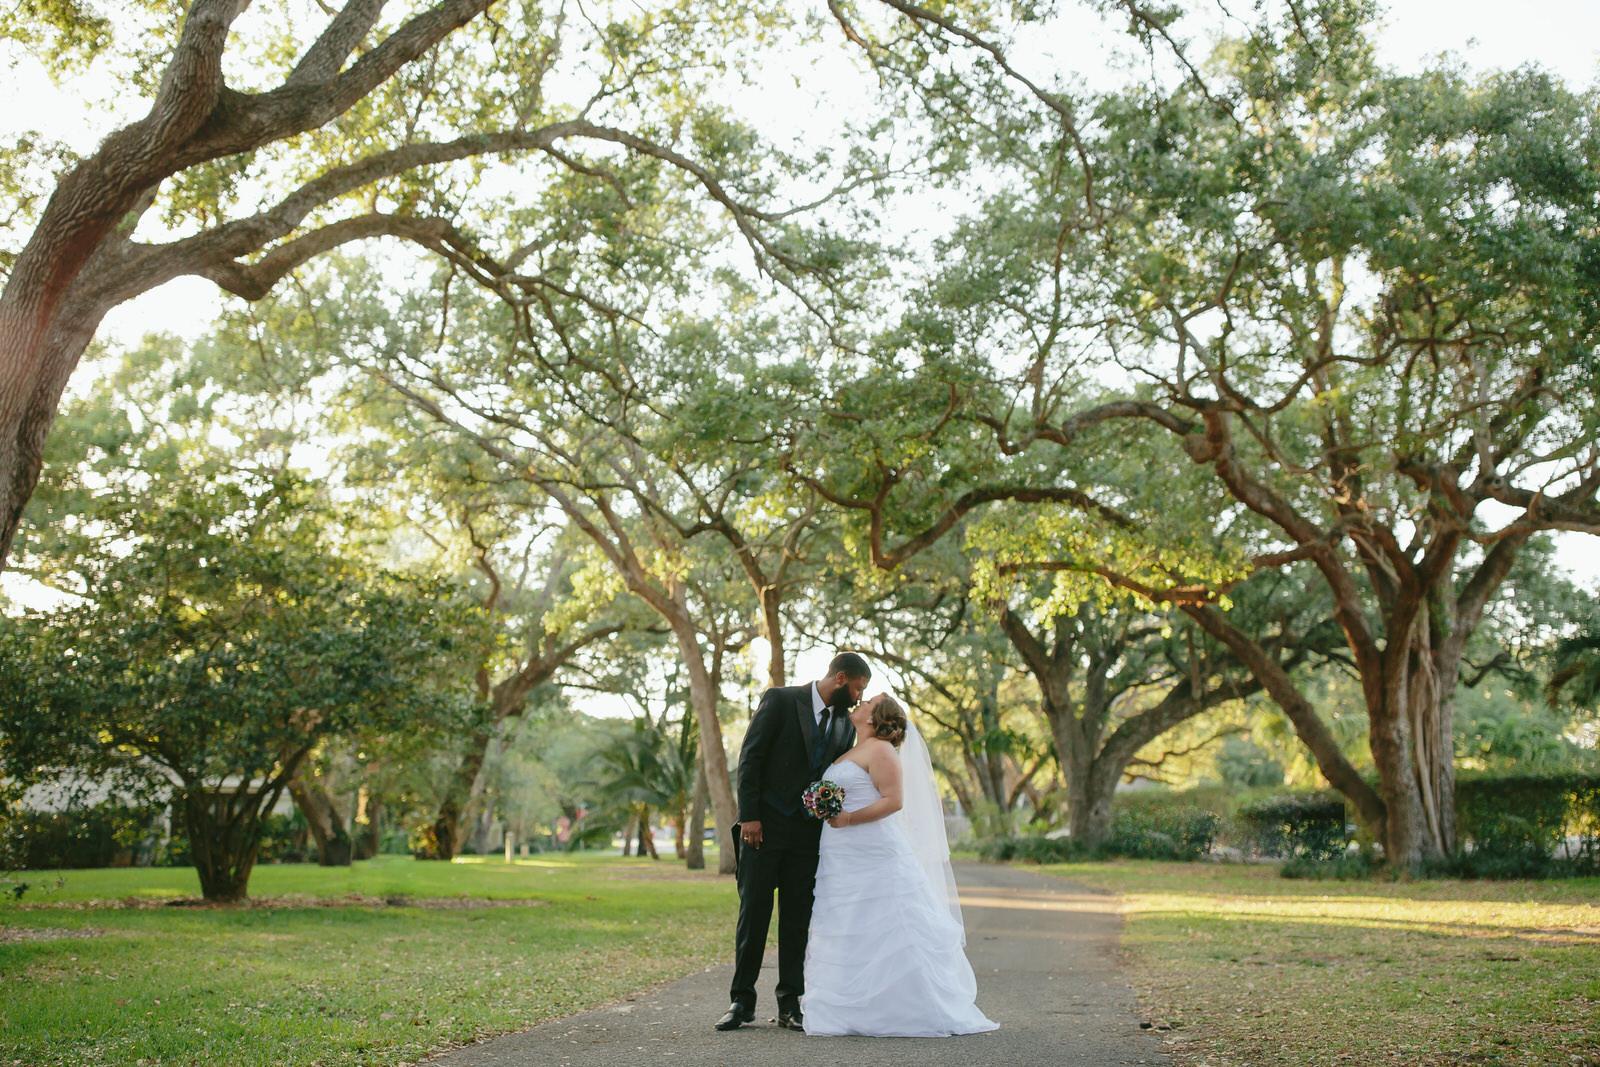 bride-groom-portrait-south-florida-backyard-wedding.jpg